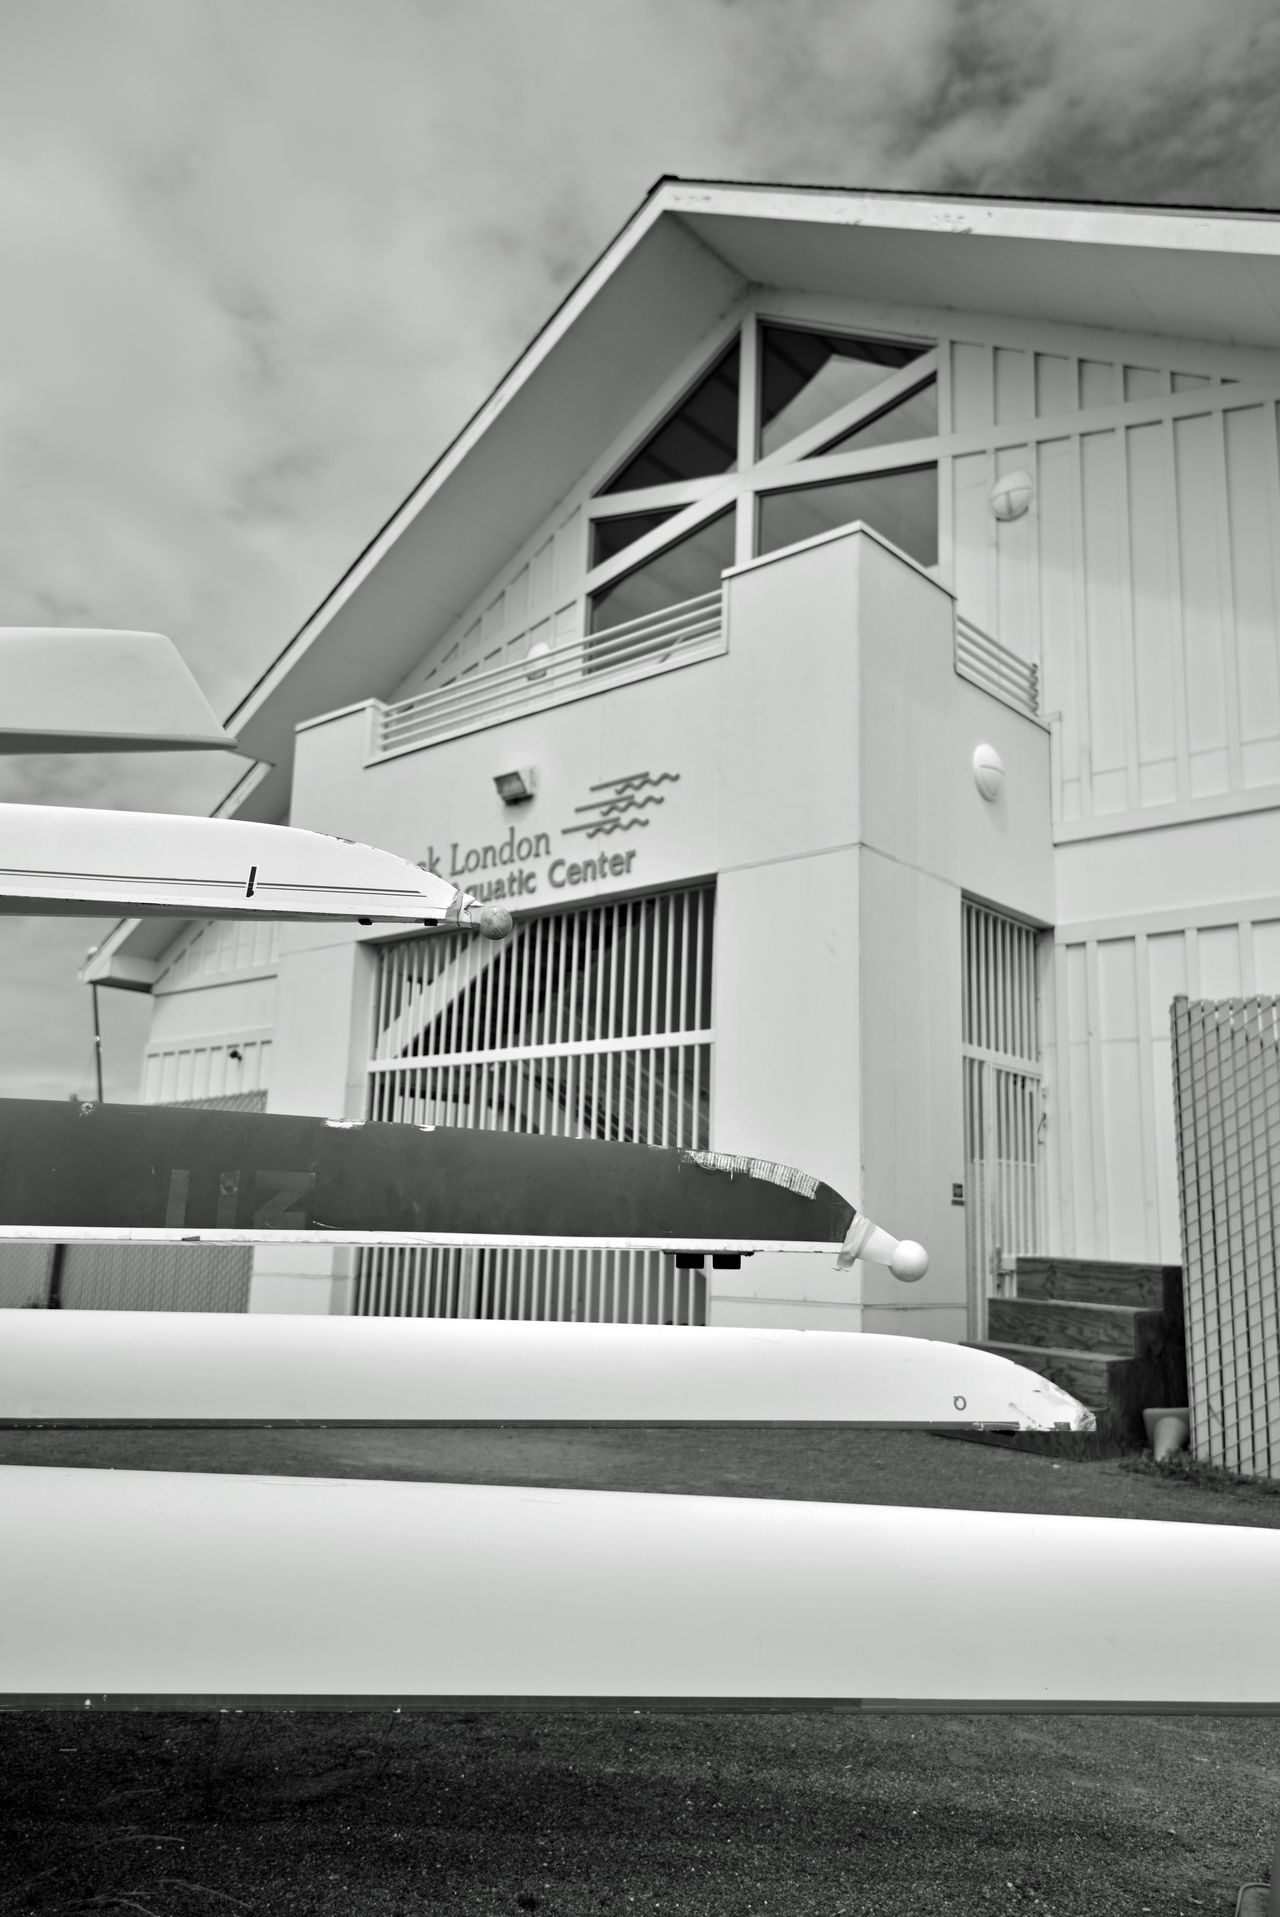 Jack London Aquatic Center @ Estuary Park 5 Embarcadero Cove Waterfront Oakland Harbor Rental Facility Jack London Square Marina Pier Aquactic Center Aquatic Soorts Boat Dock Boat Launch Boat Rental Rowing Club Kyacks Racked & Stacked Black And White Black And White Collection  Blackandwhite Photography Geometric Patterns